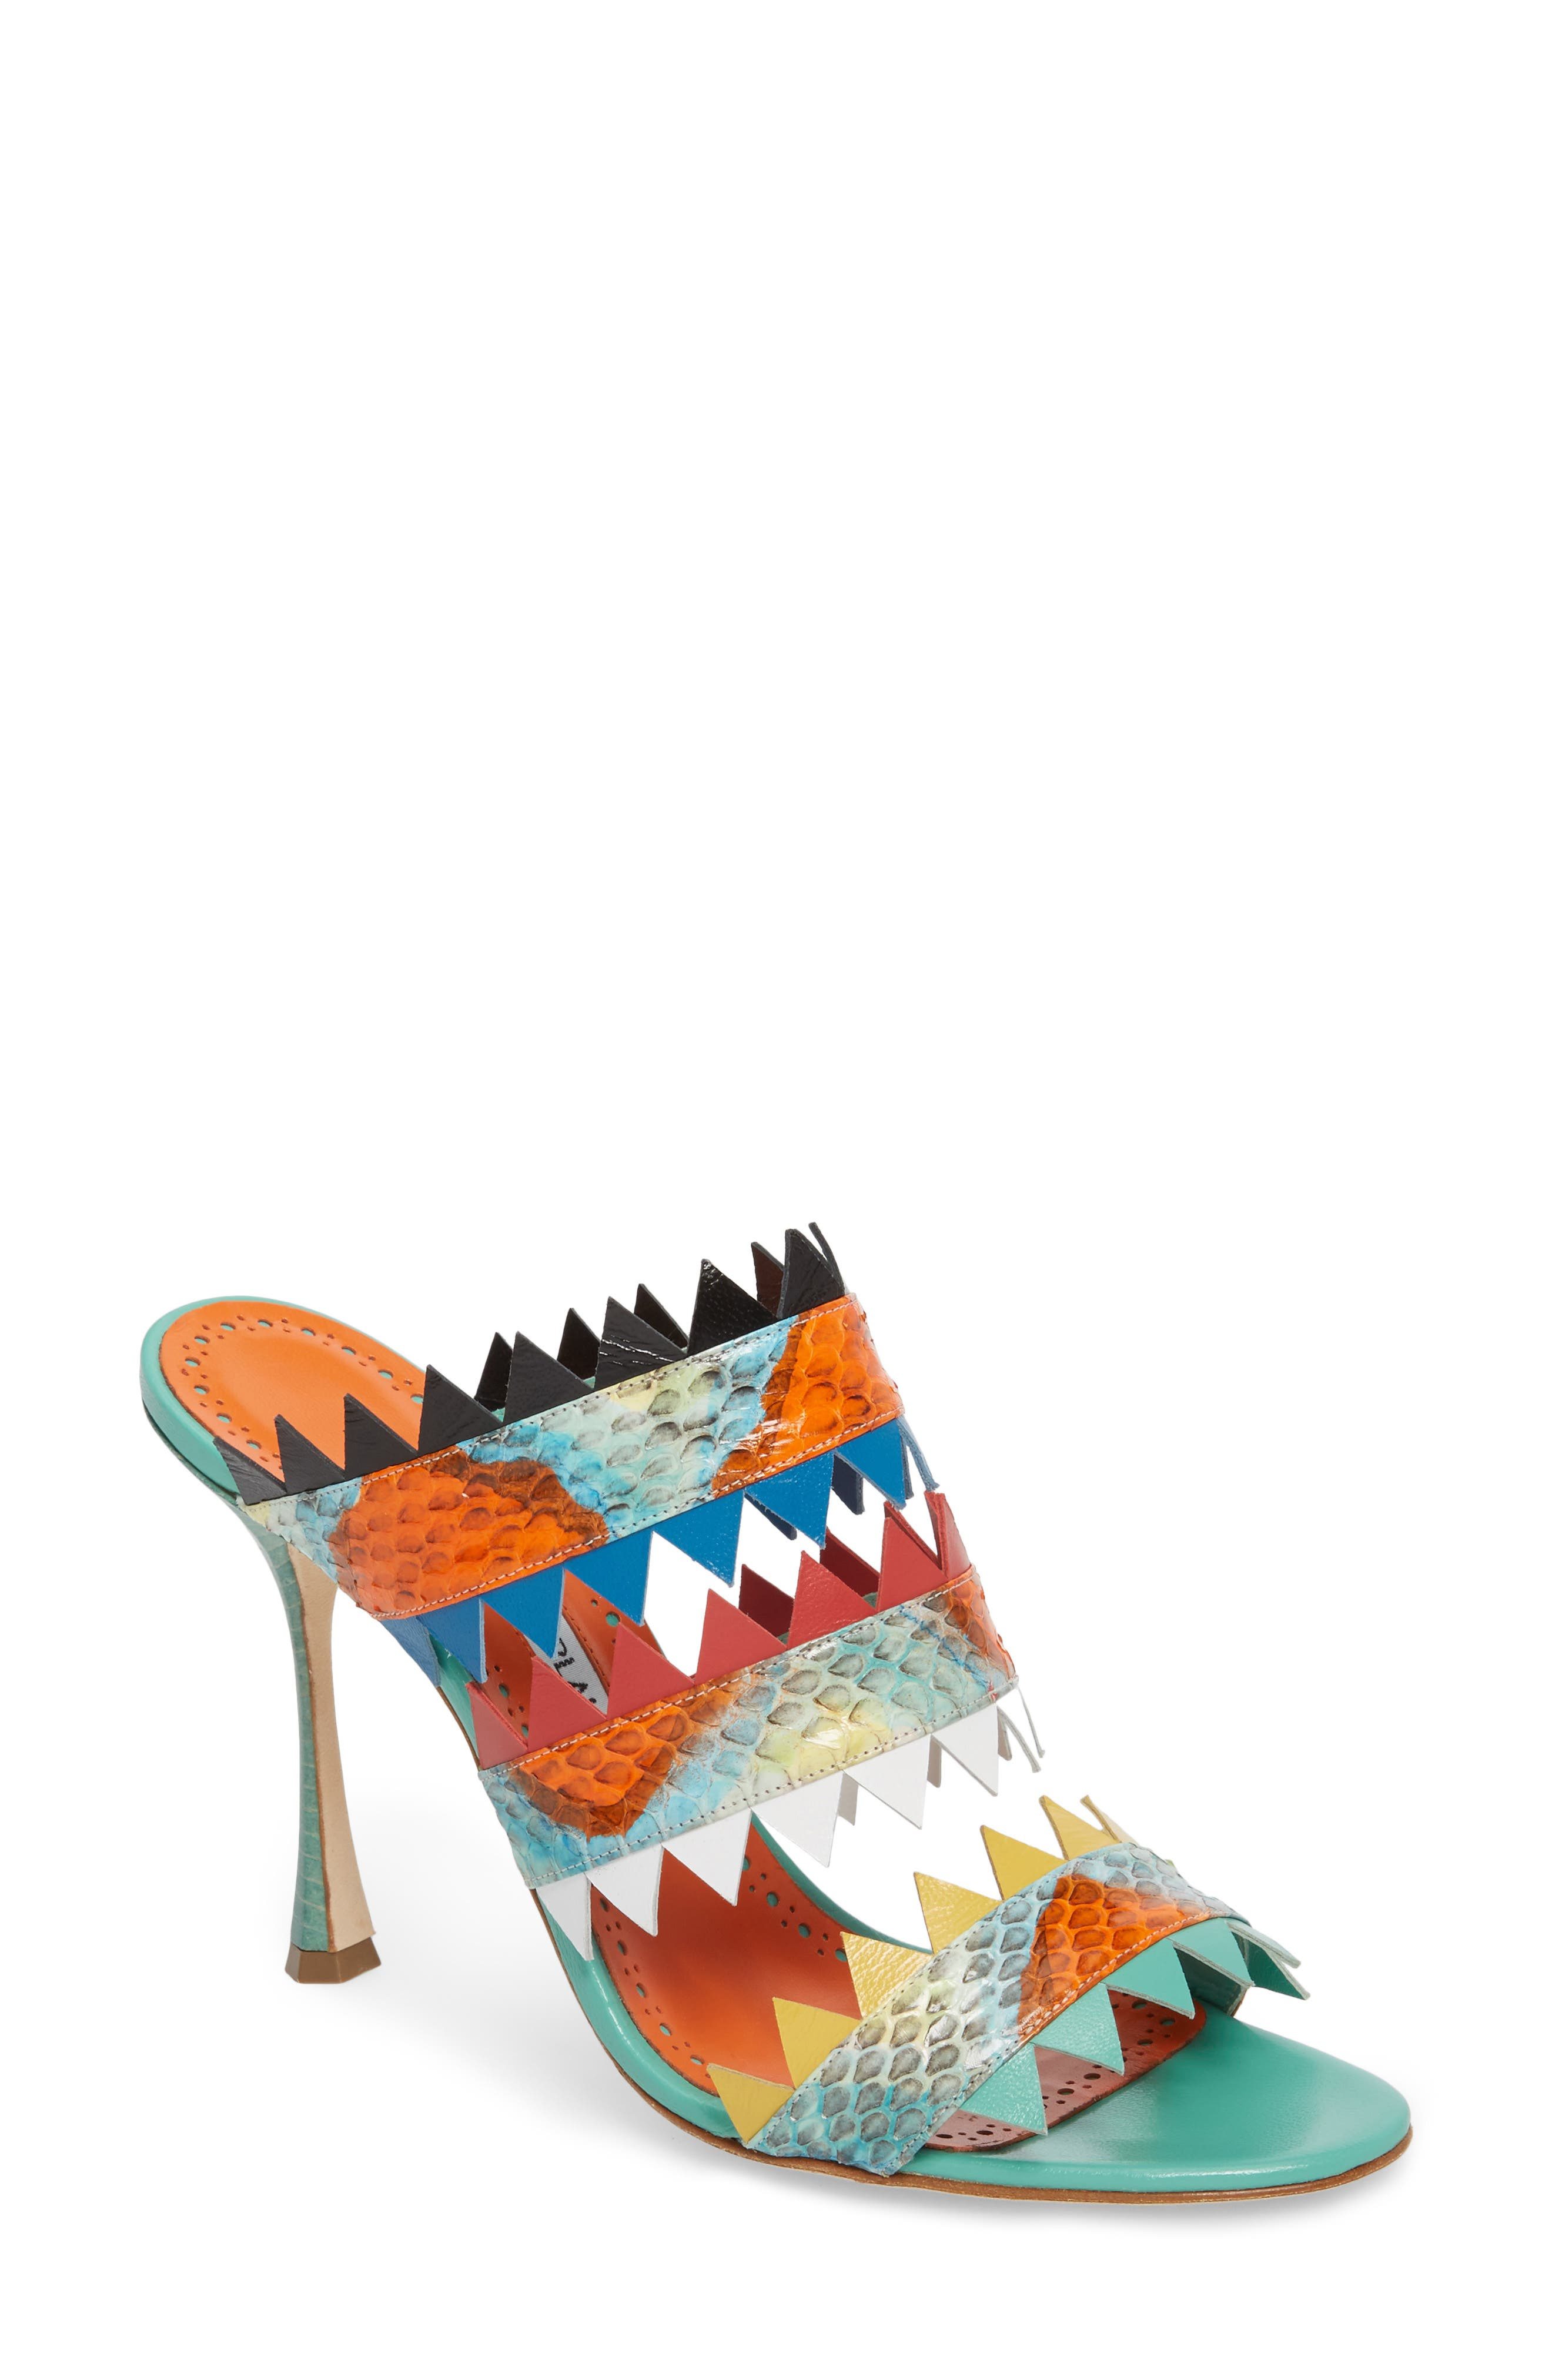 Arpege Mule Sandal,                         Main,                         color,